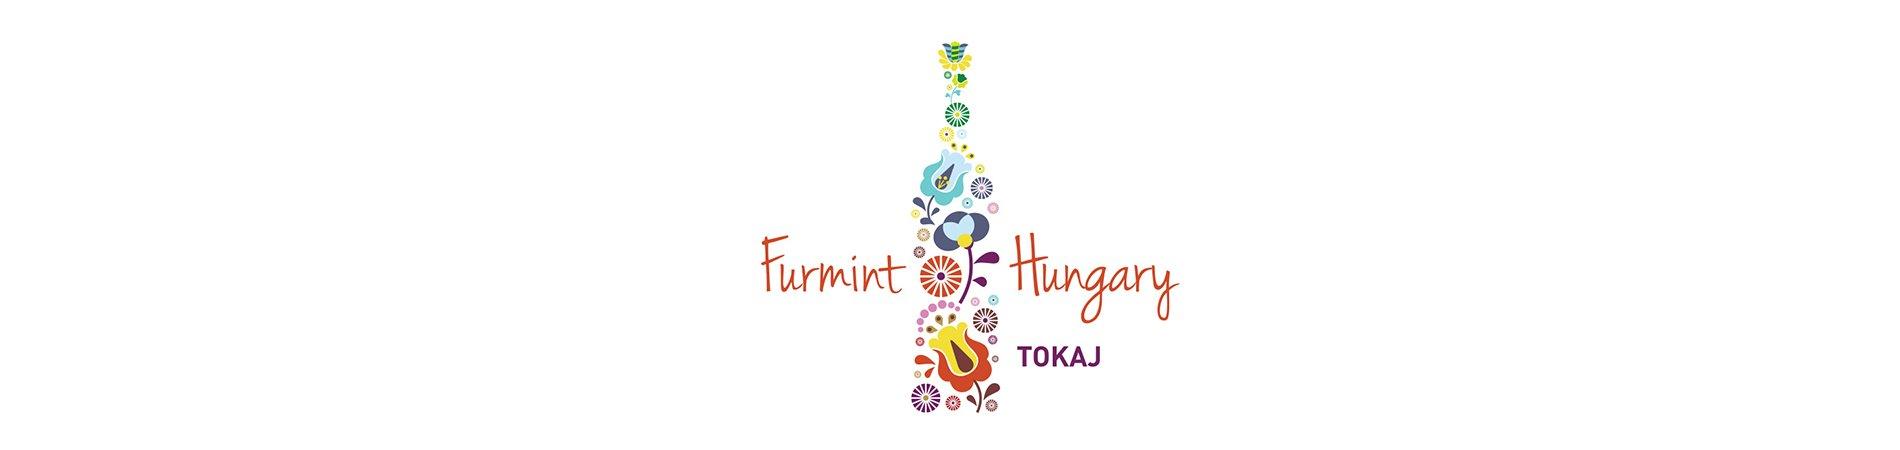 01_Slider_Furmint_of_Hungary